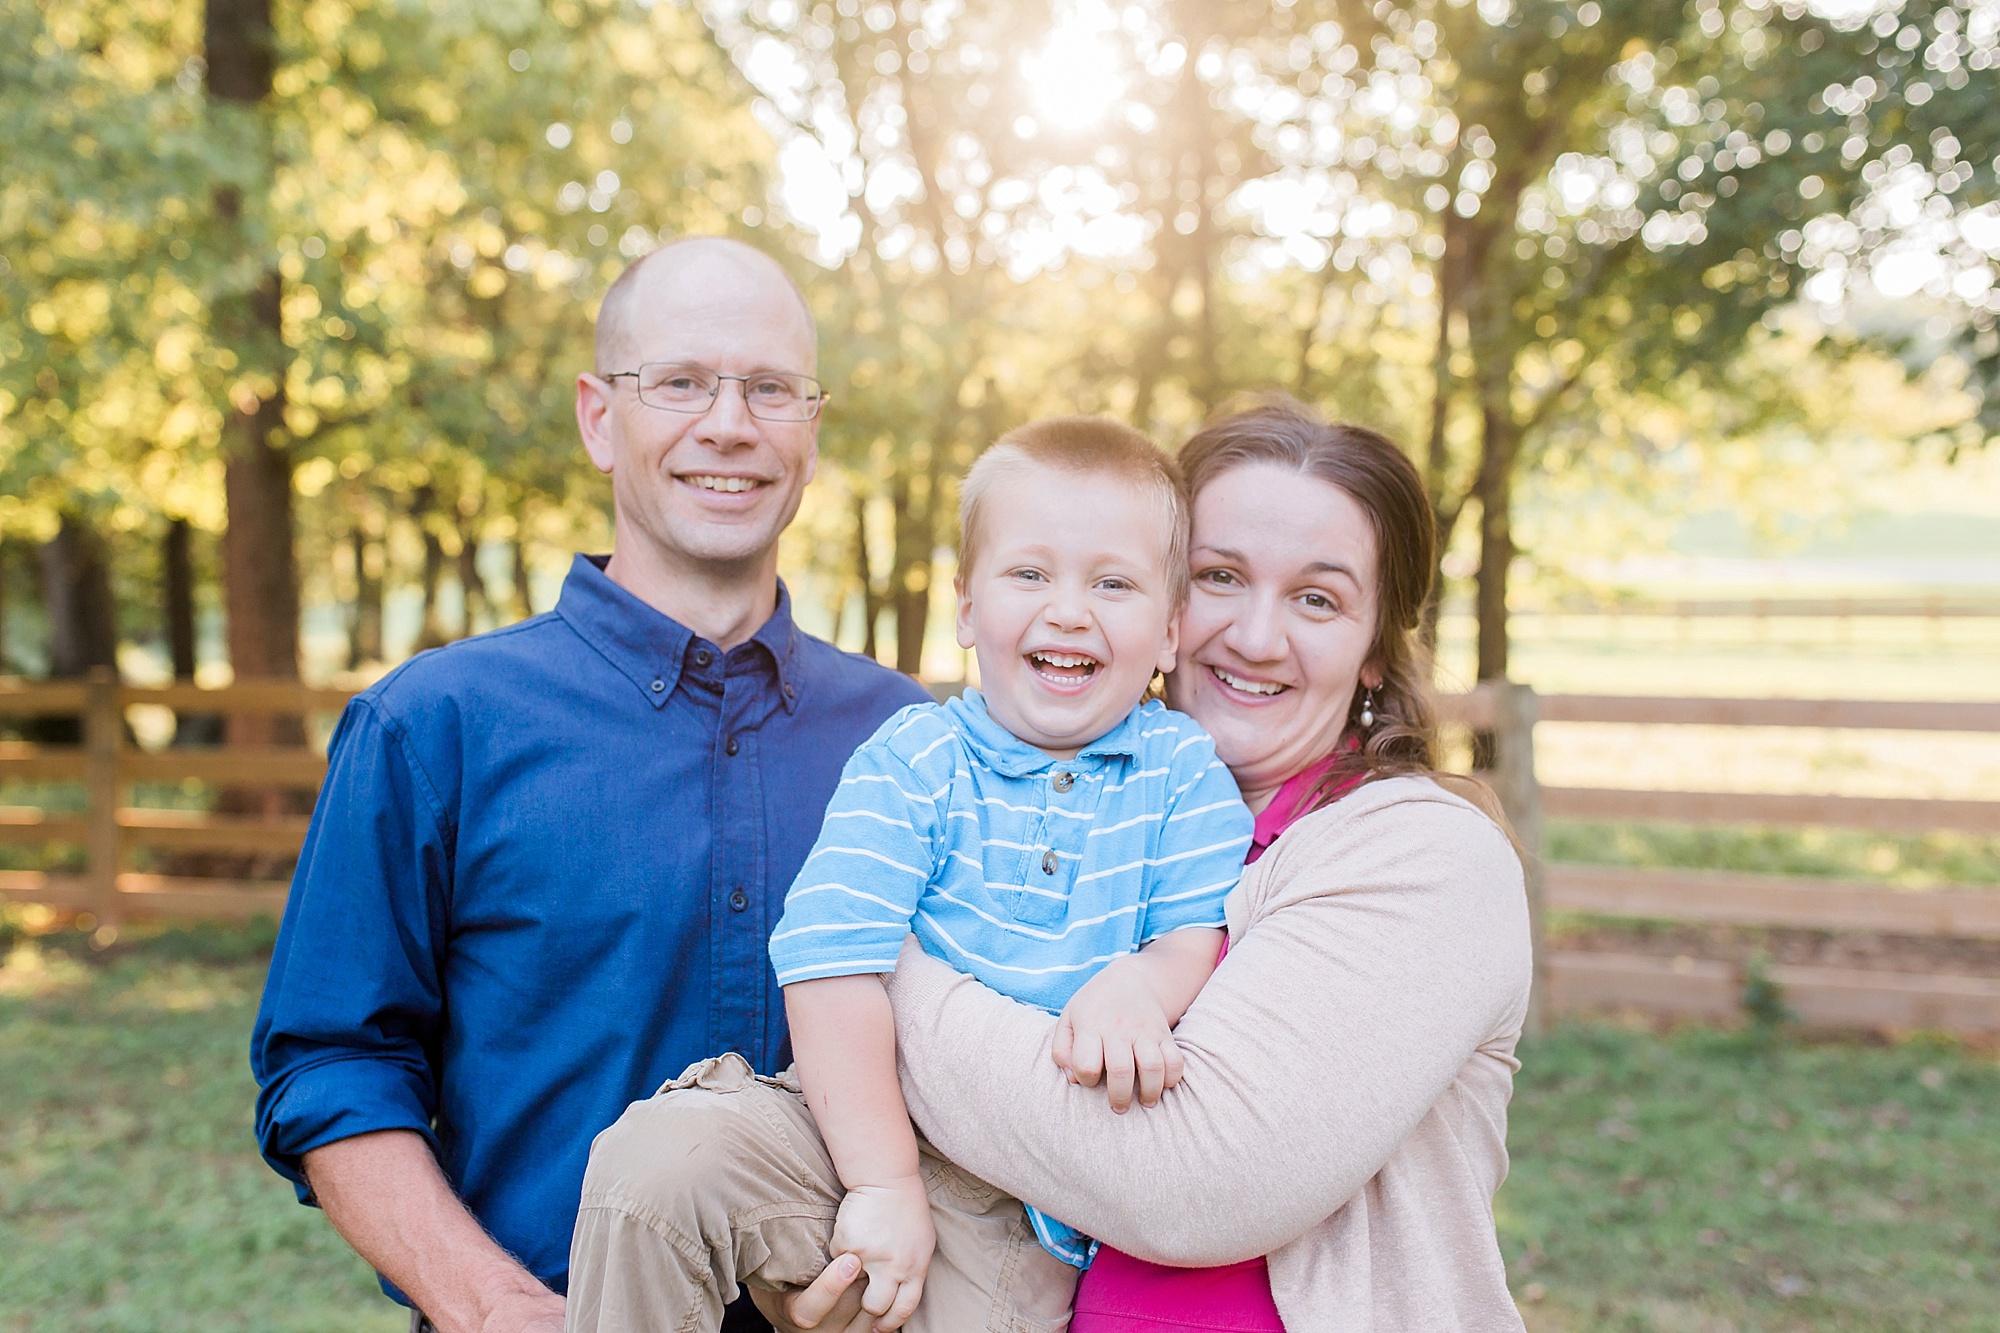 family pictures photographer winston salem